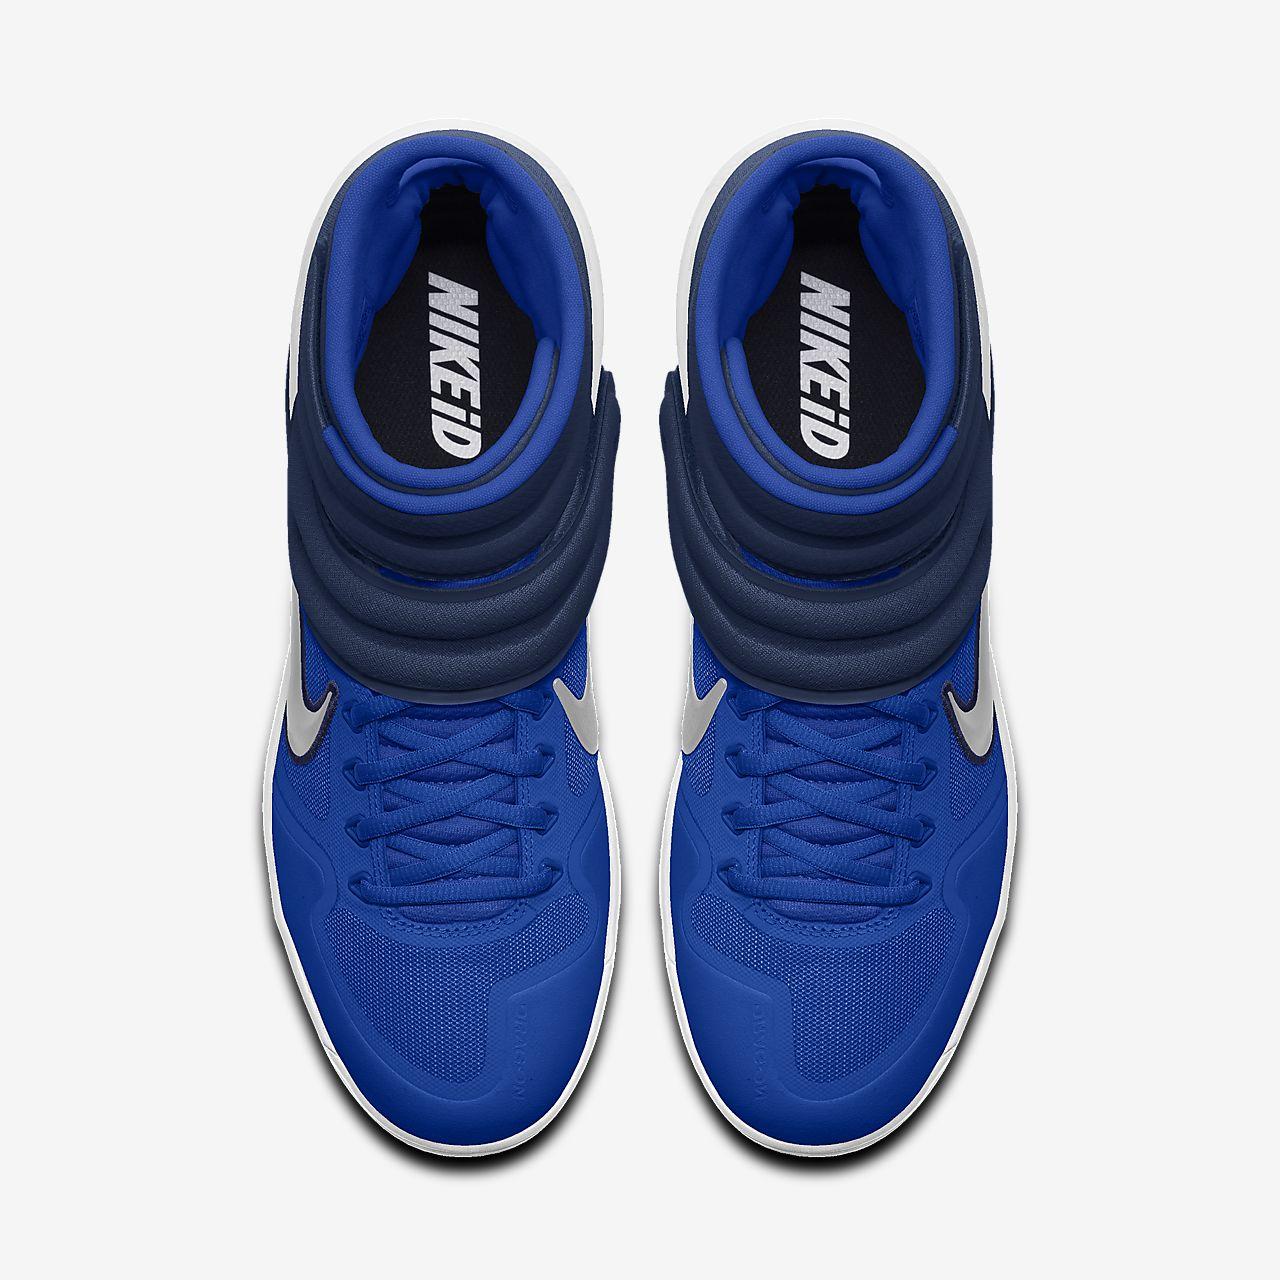 Chaussure de baseball à crampons personnalisable Nike Alpha Huarache Elite 2 Mid By You